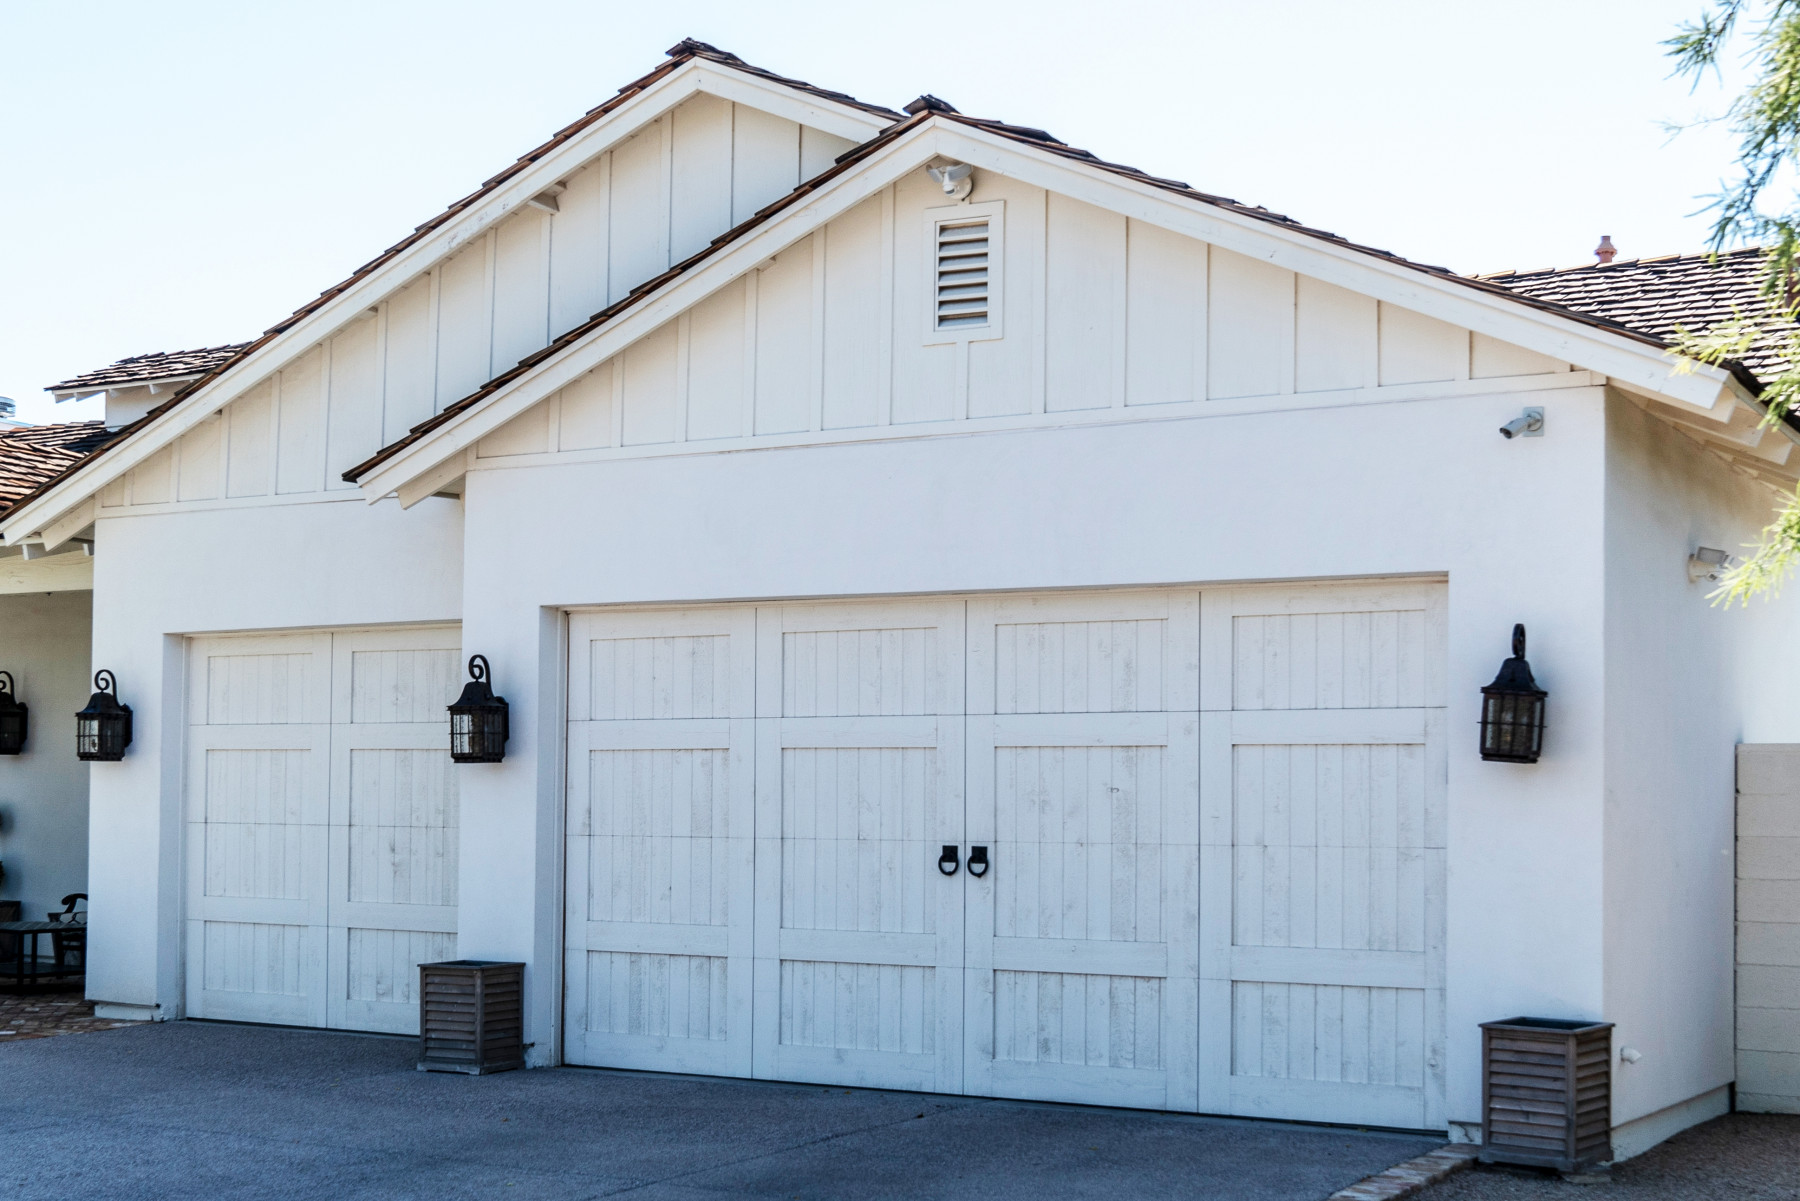 exterior garage lighting - Tim Kyle